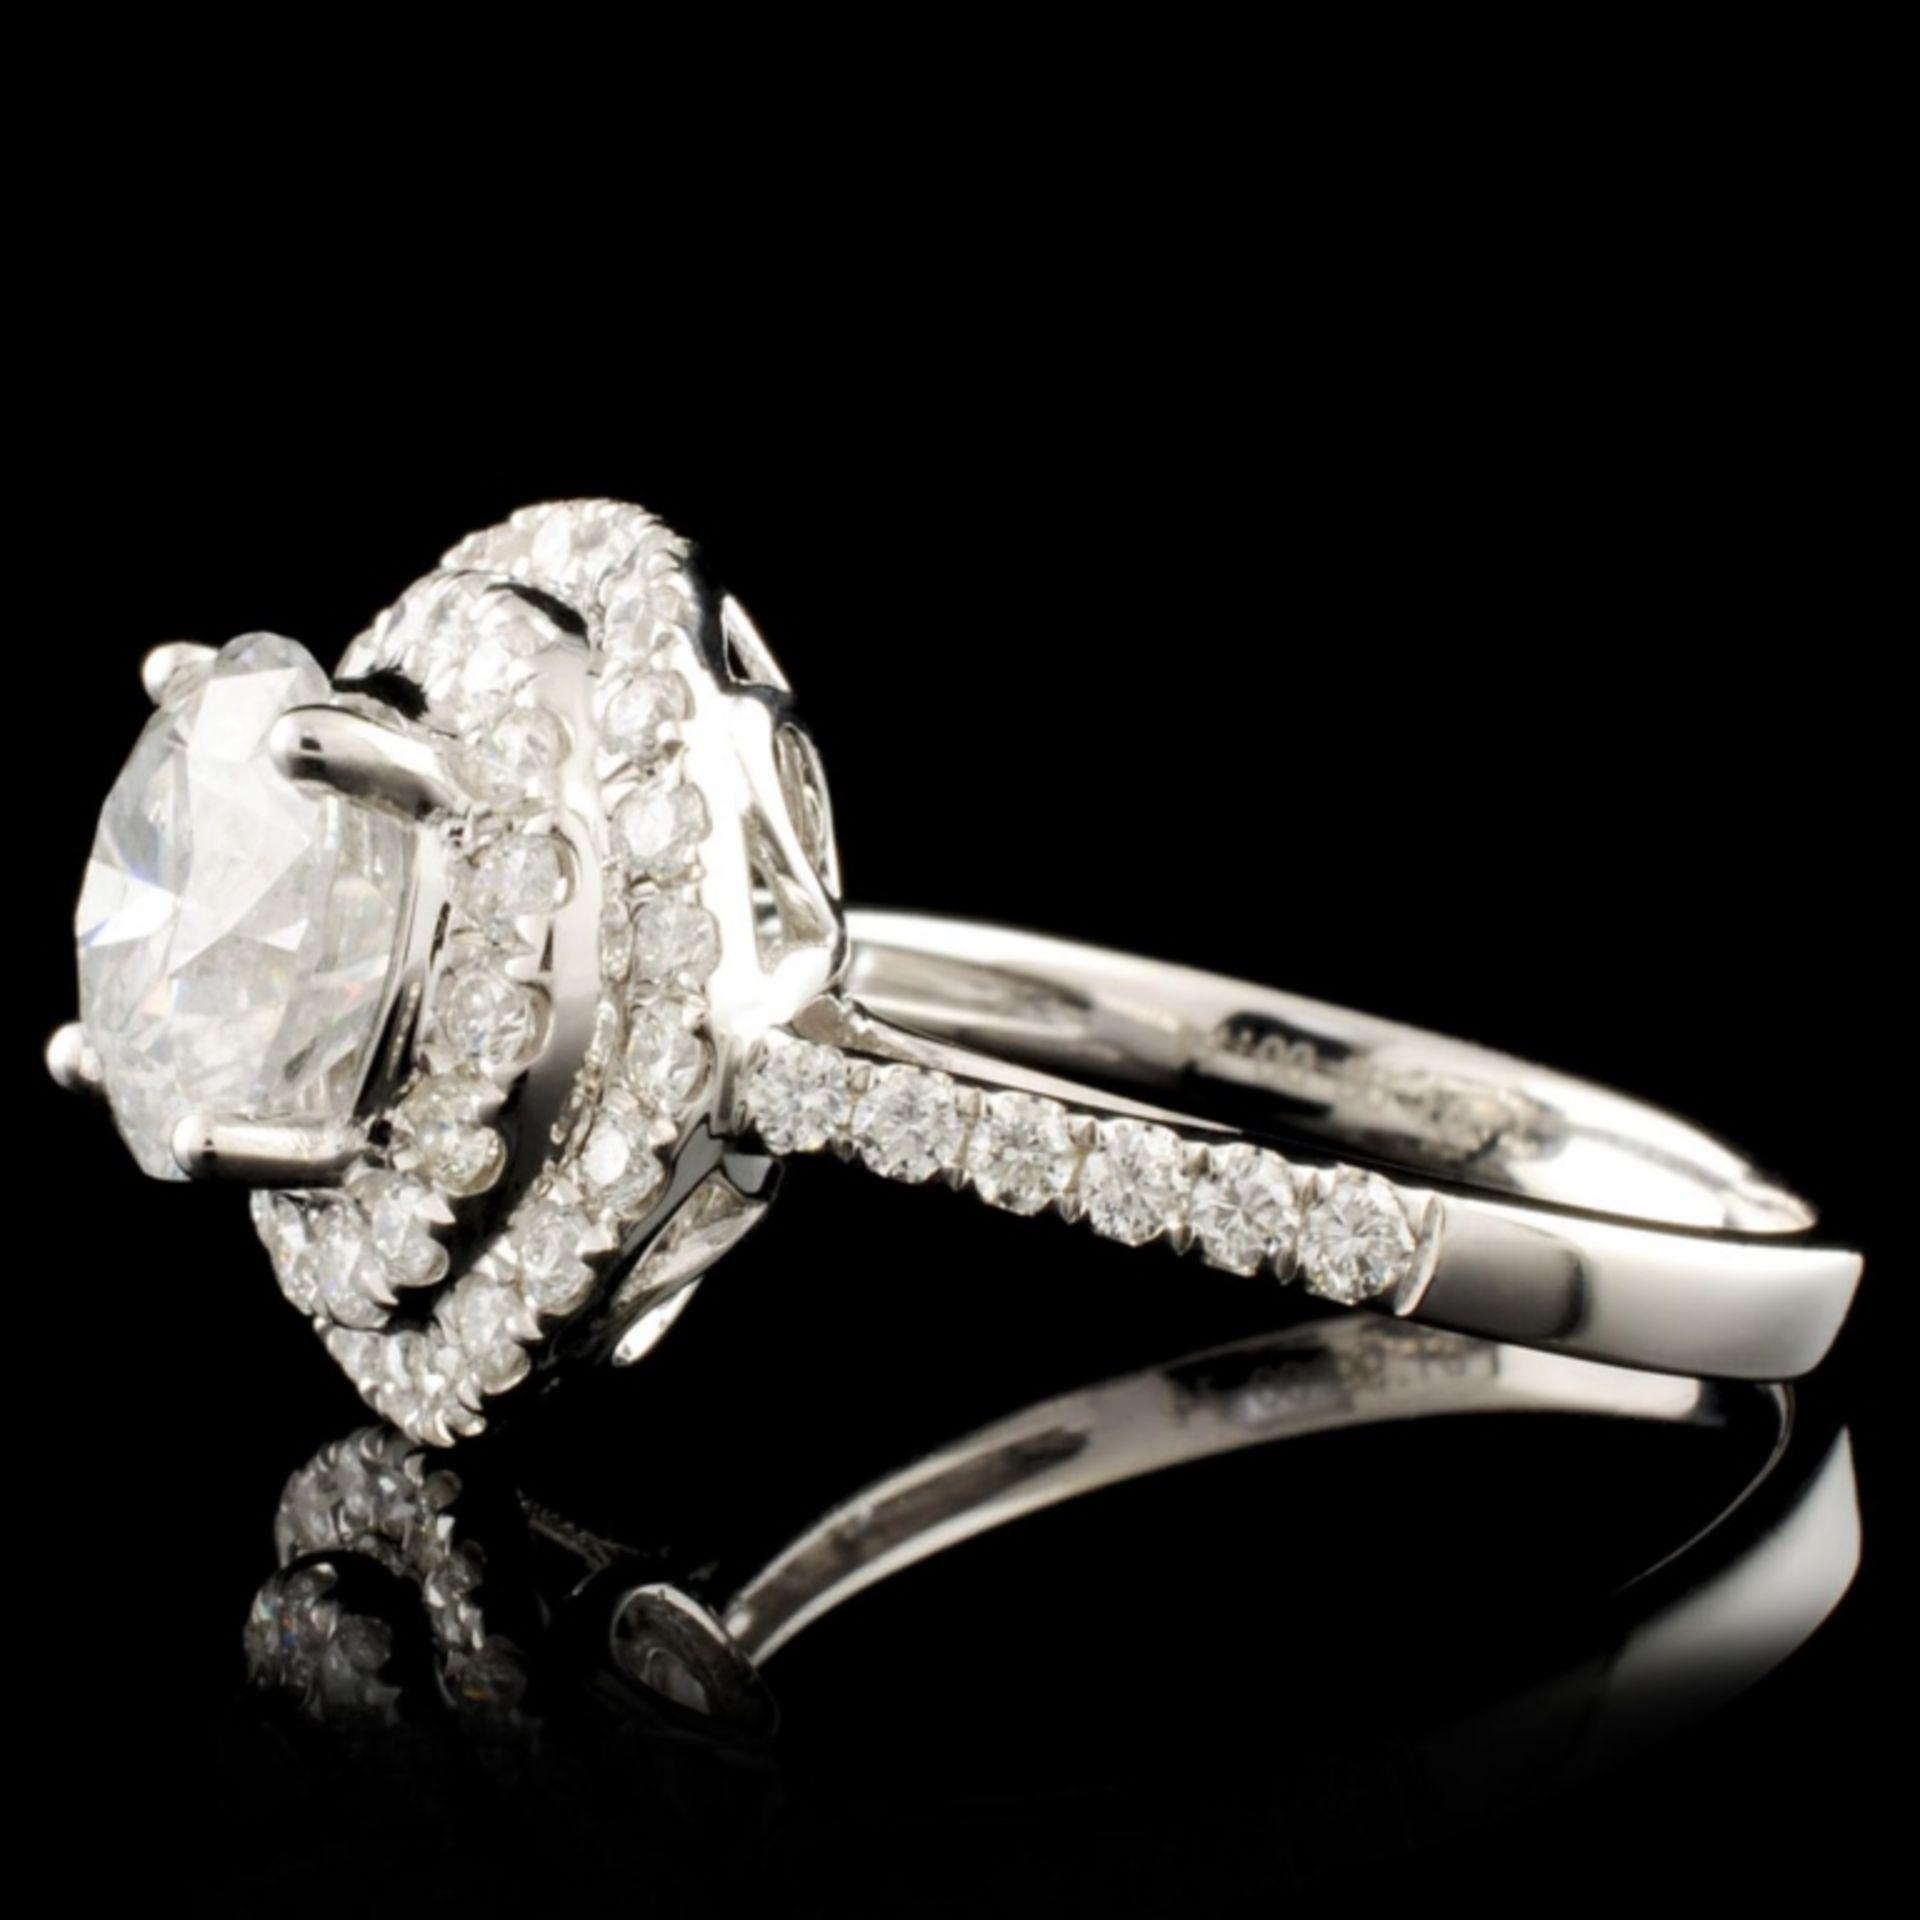 18K Gold 2.73ctw Diamond Ring - Image 4 of 7